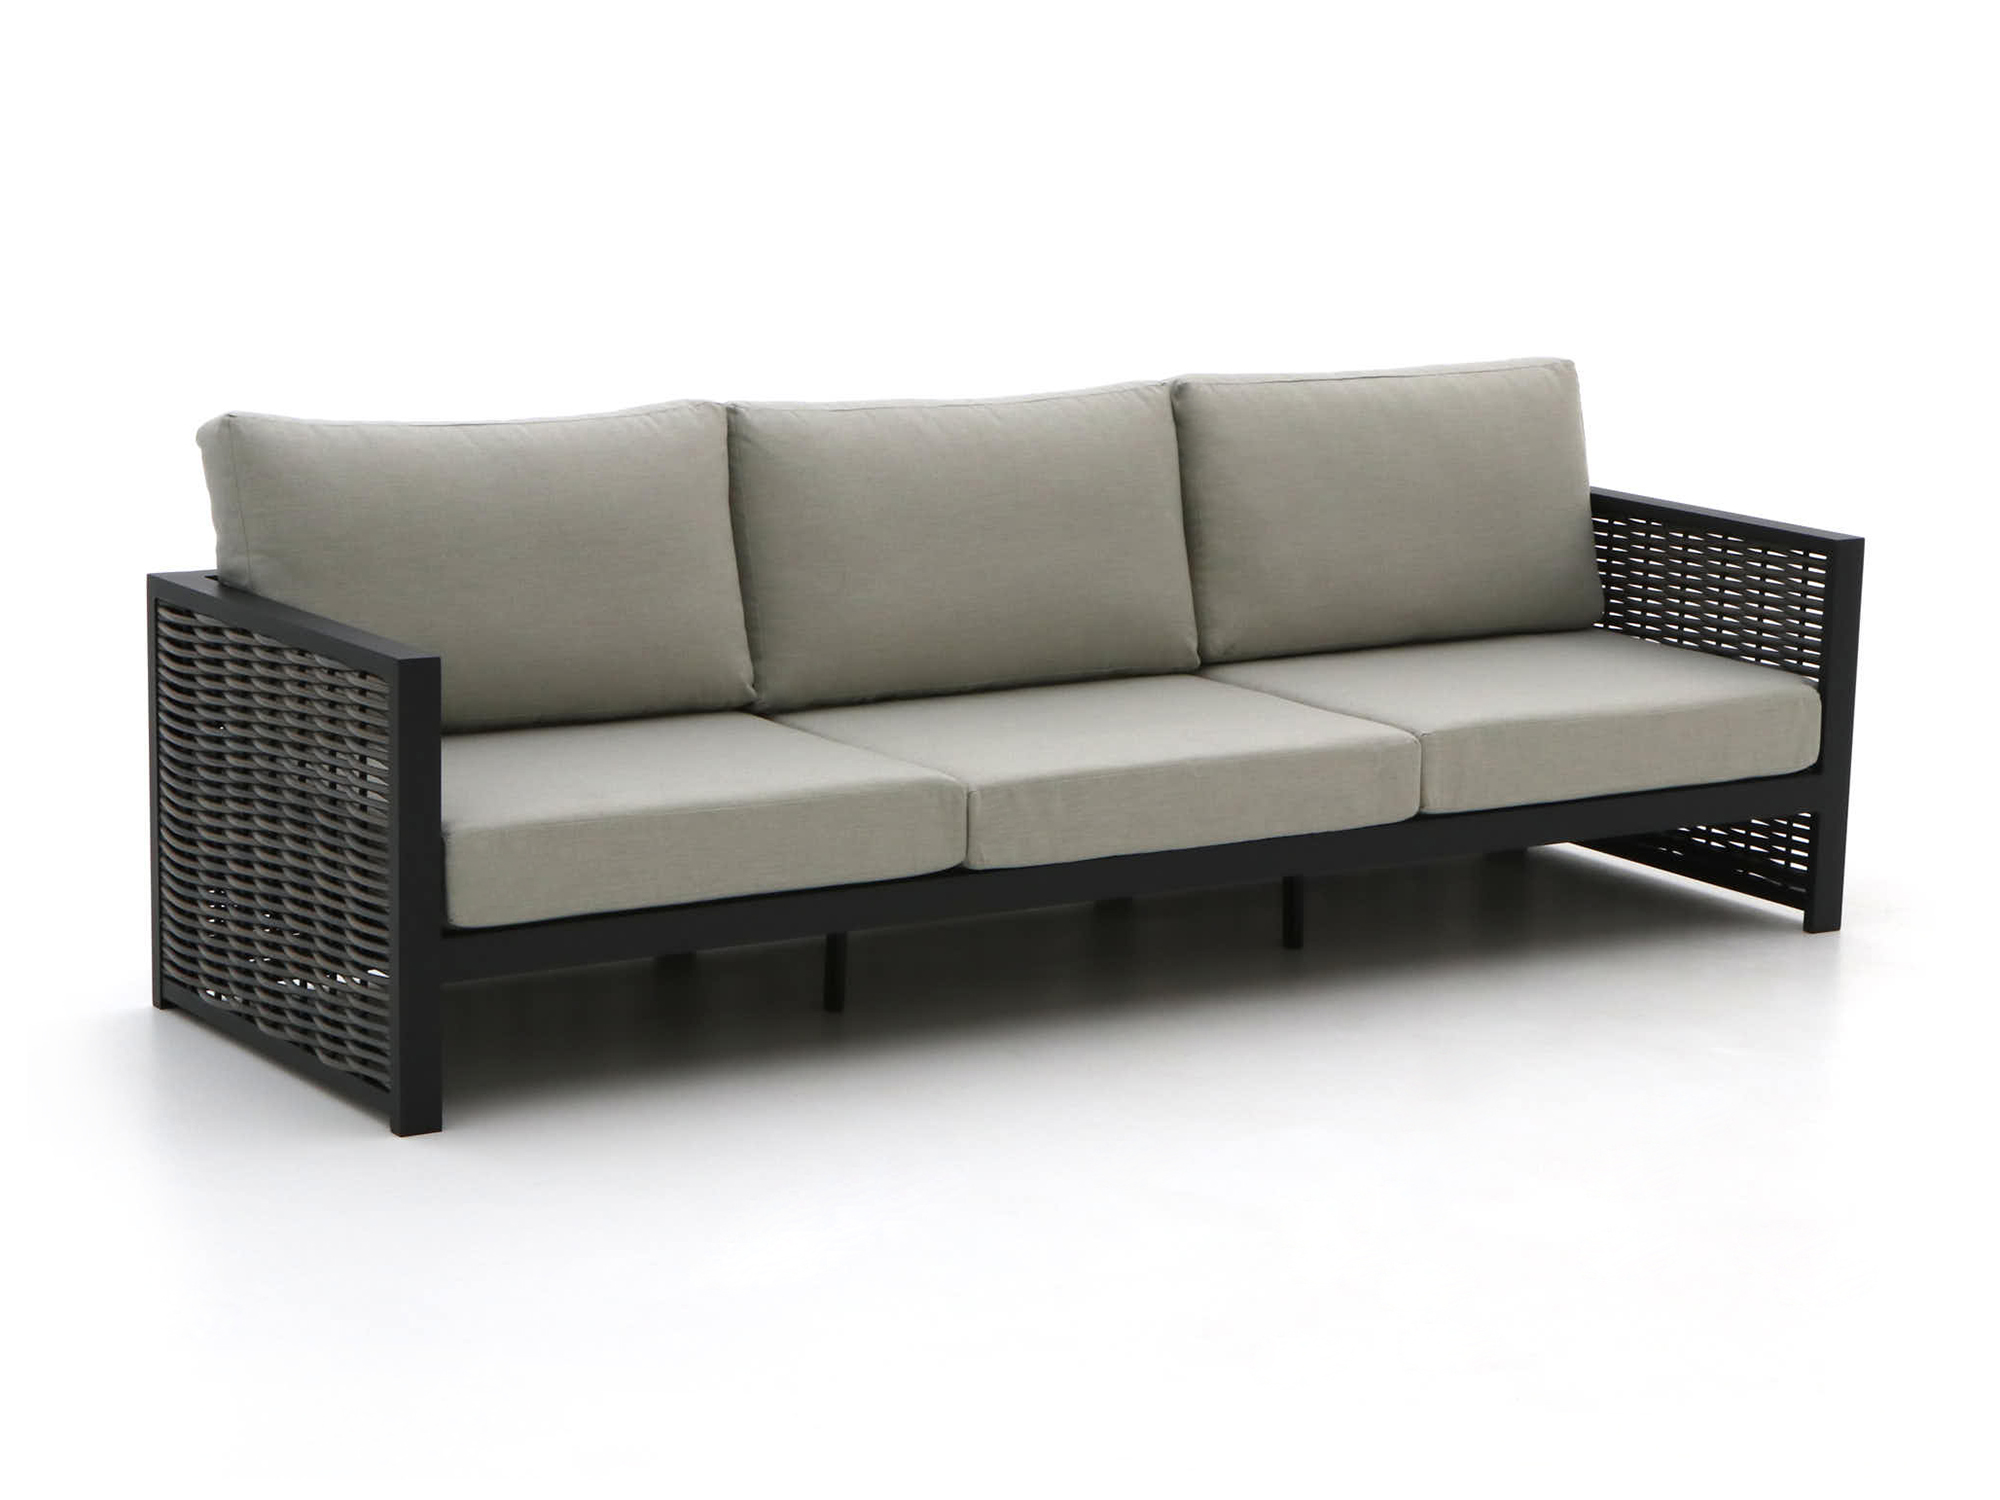 Bellagio Cadora lounge tuinbank 3-zits 252cm - Laagste prijsgarantie!